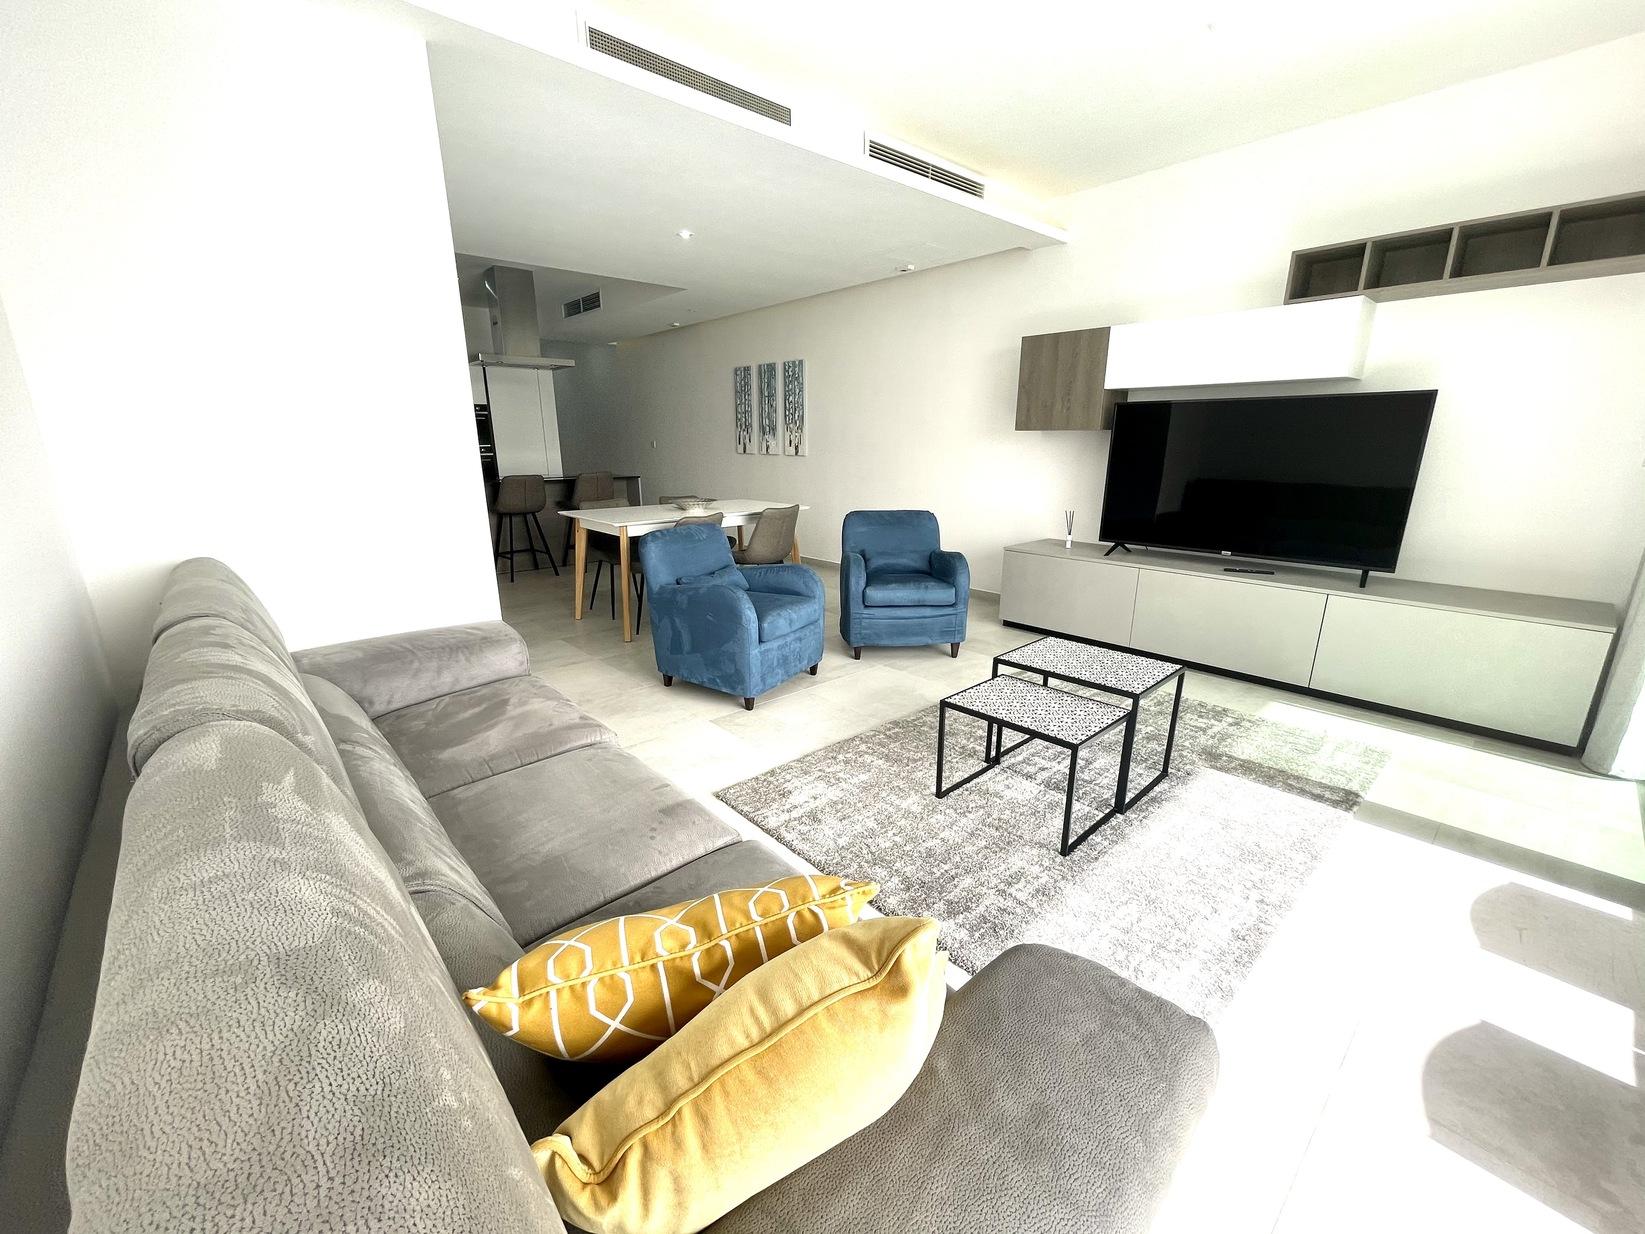 2 bed Apartment For Rent in Sliema, Sliema - thumb 3